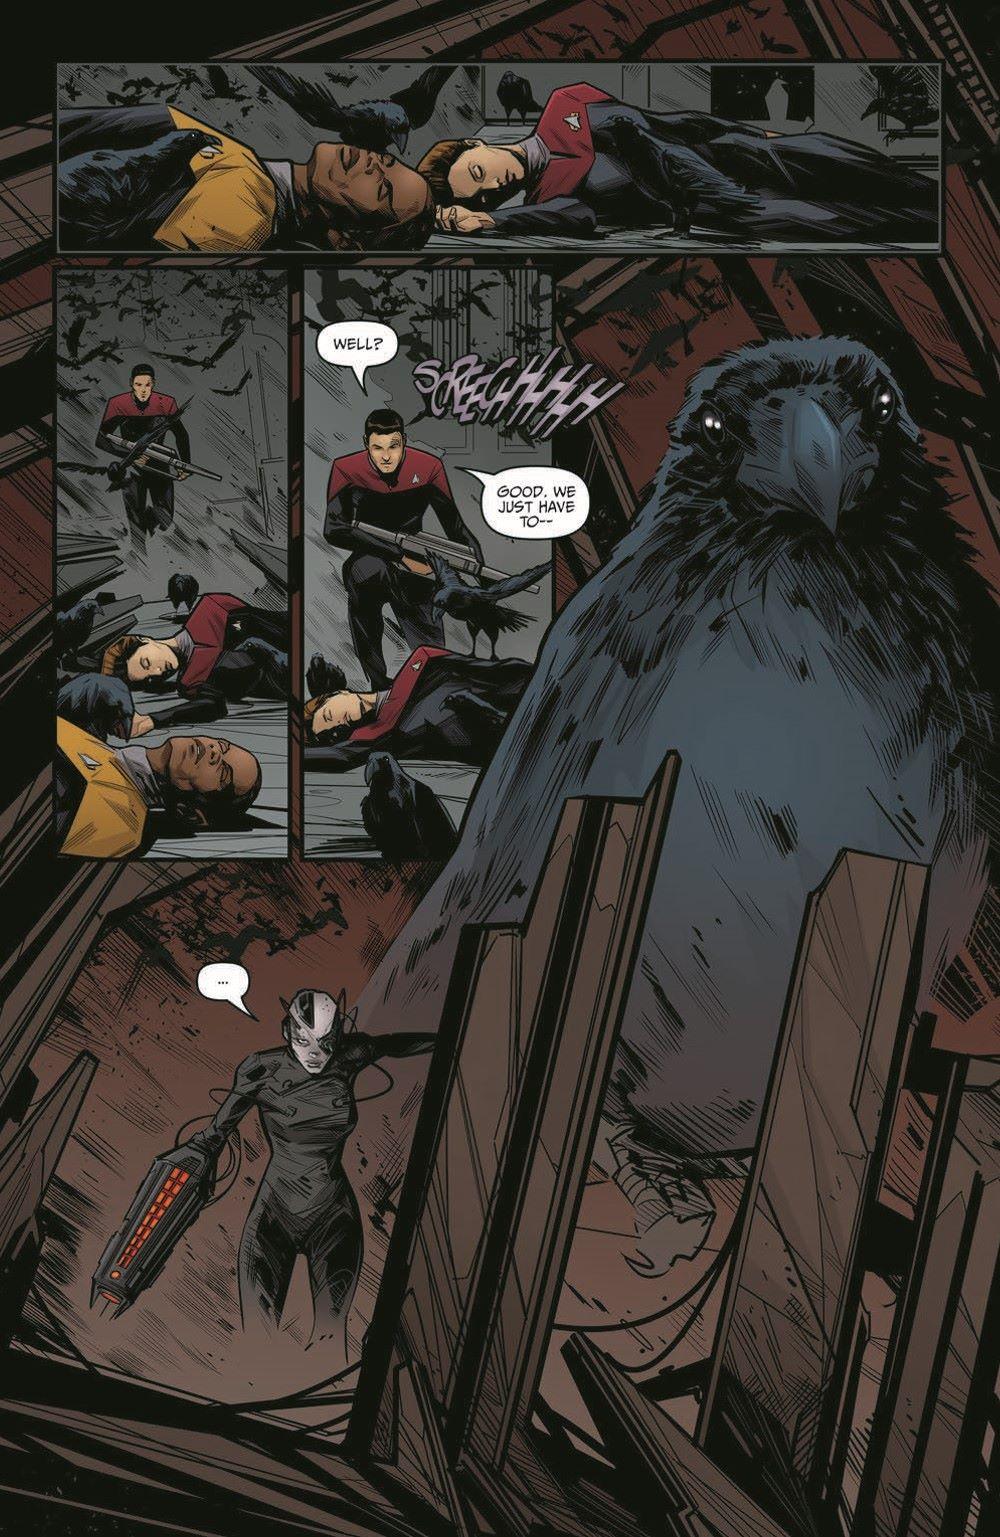 ST_Voyager_SR04-pr-3 ComicList Previews: STAR TREK VOYAGER SEVEN'S RECKONING #4 (OF 4)